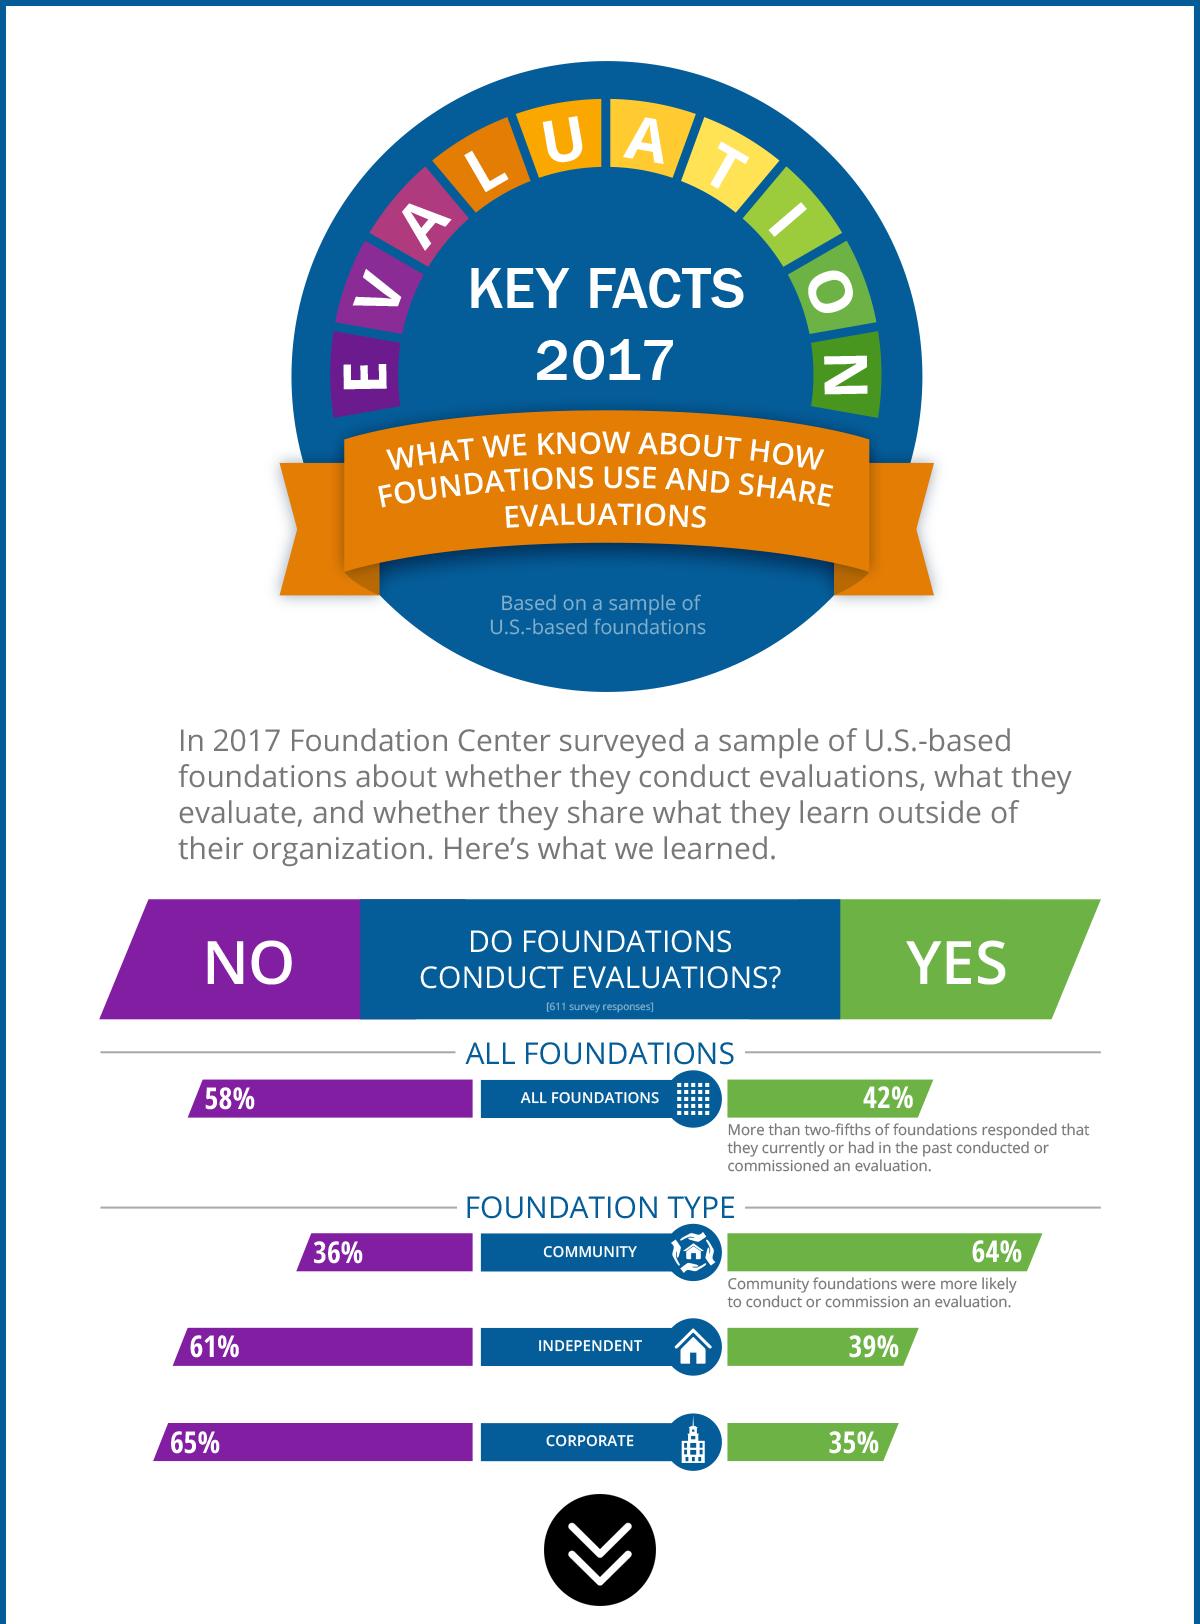 Key Facts on Foundation Evaluation, 2017